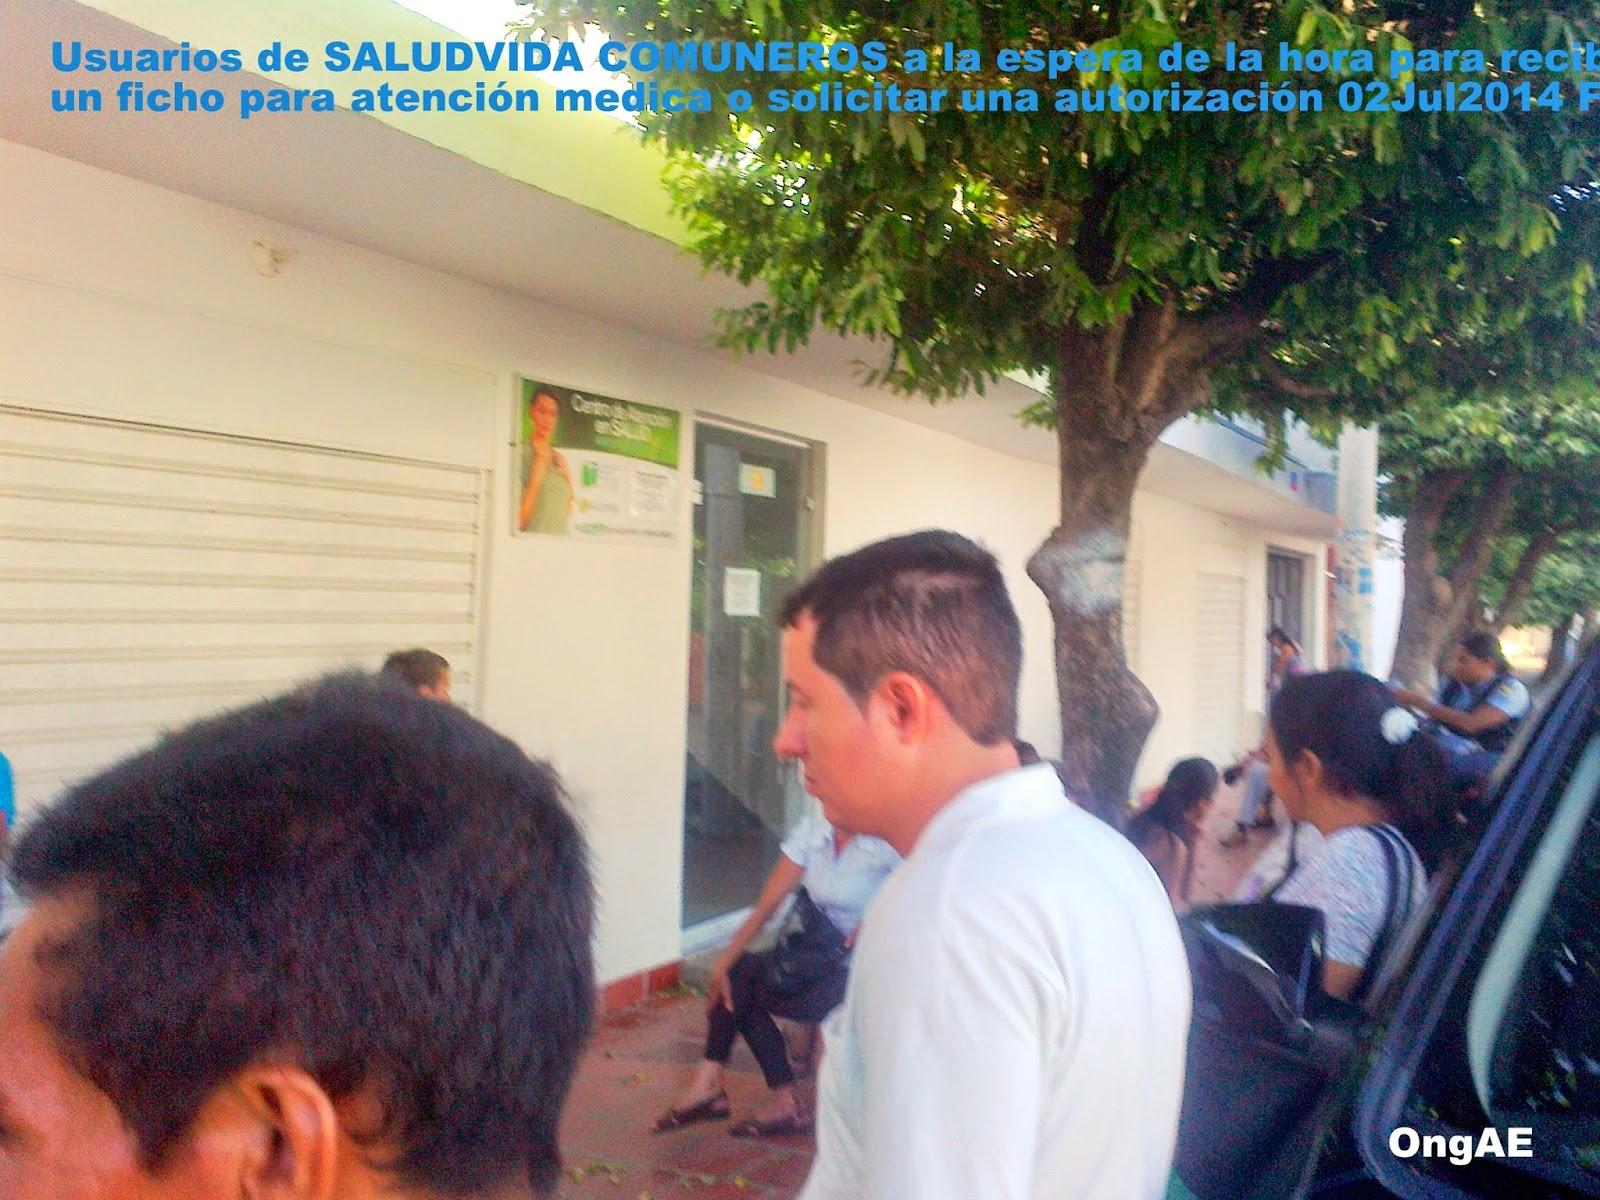 Usuarios frente a SALUDVIDA Comuneros Foto FelixNOTICIAS para OngAE 02Jul2014